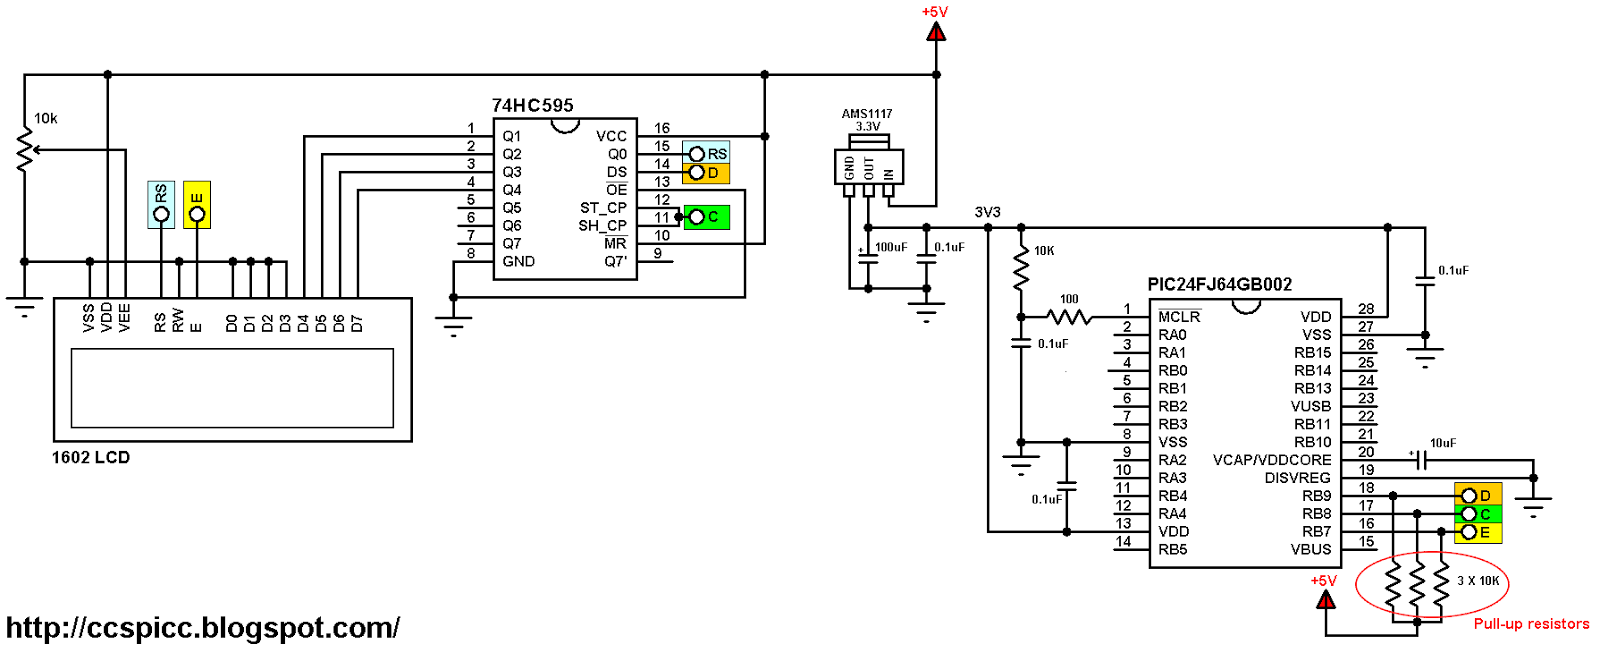 Interfacing PIC24FJ64GB002 with LCD